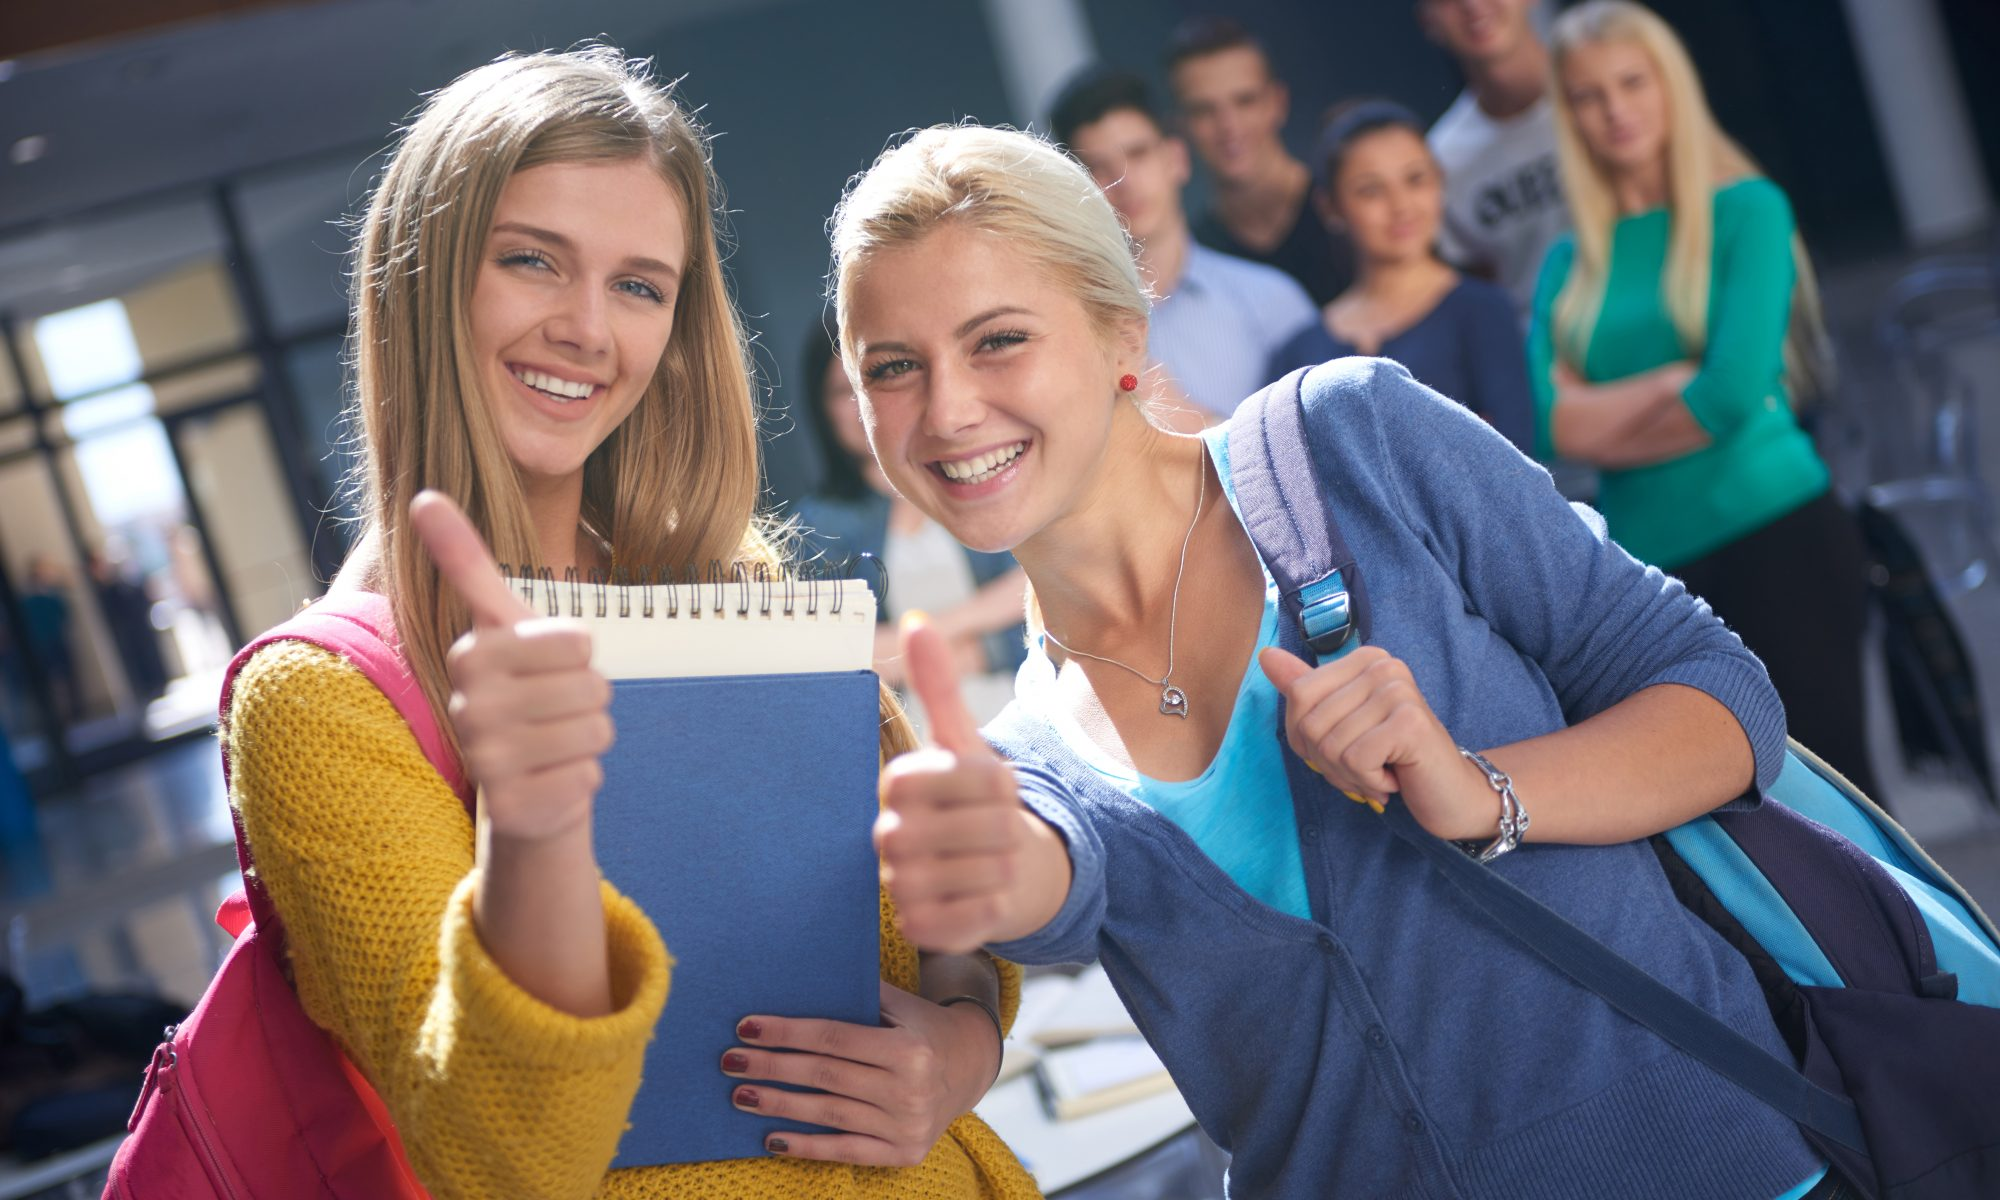 CMI Leadership Courses